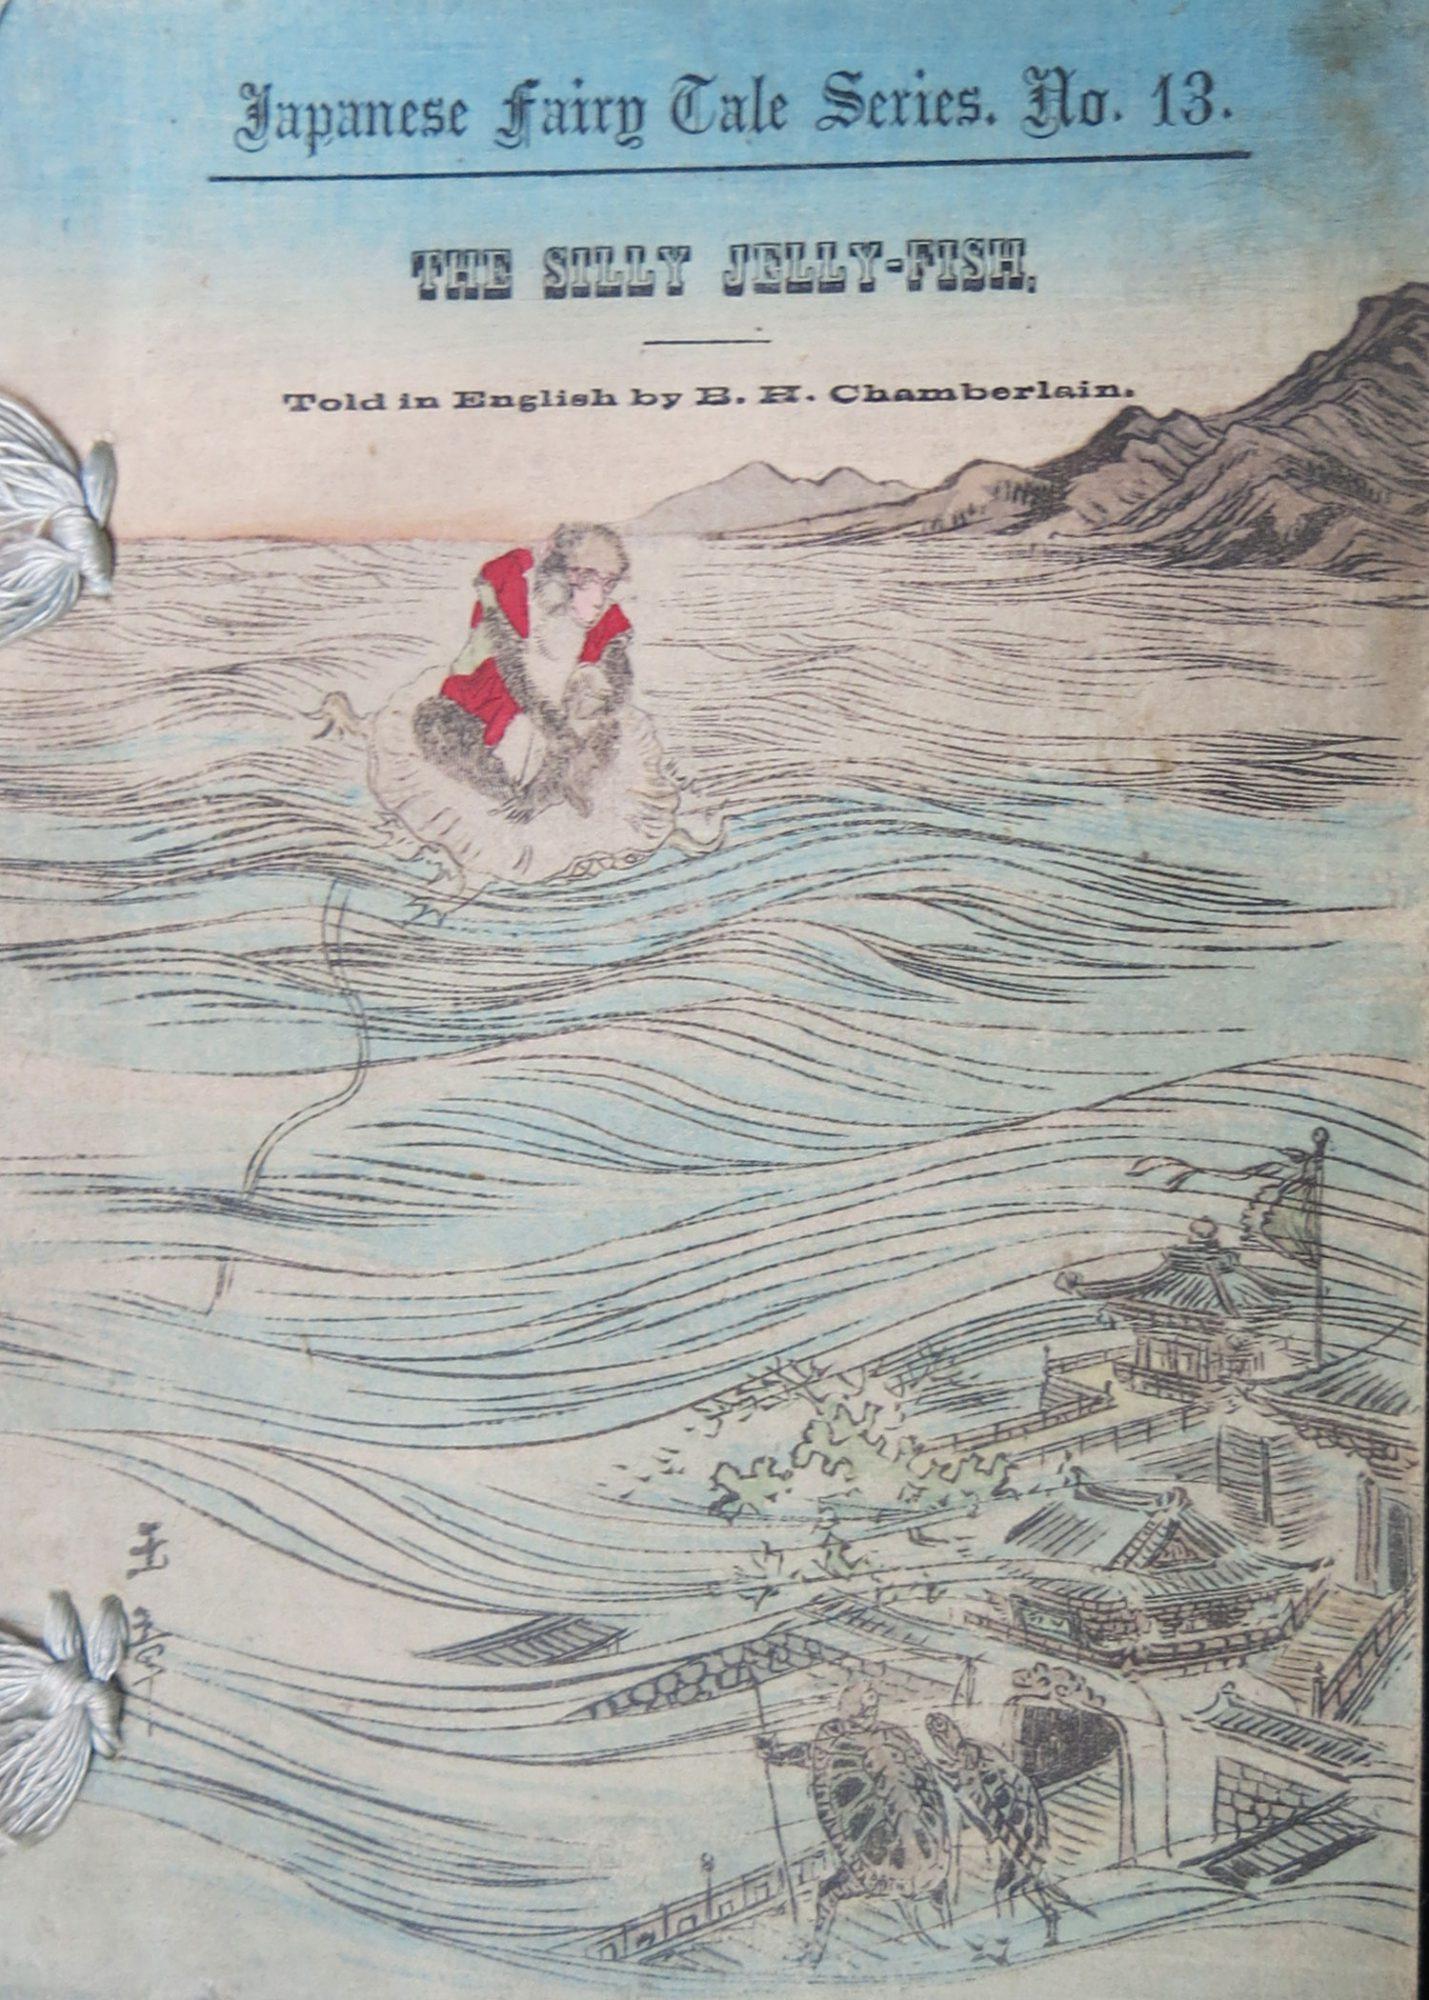 The Silly Jelly-Fish, Told in English by B.H. Chamberlain. [川端 玉章 Gyokusho Kawabata (illustrator)]